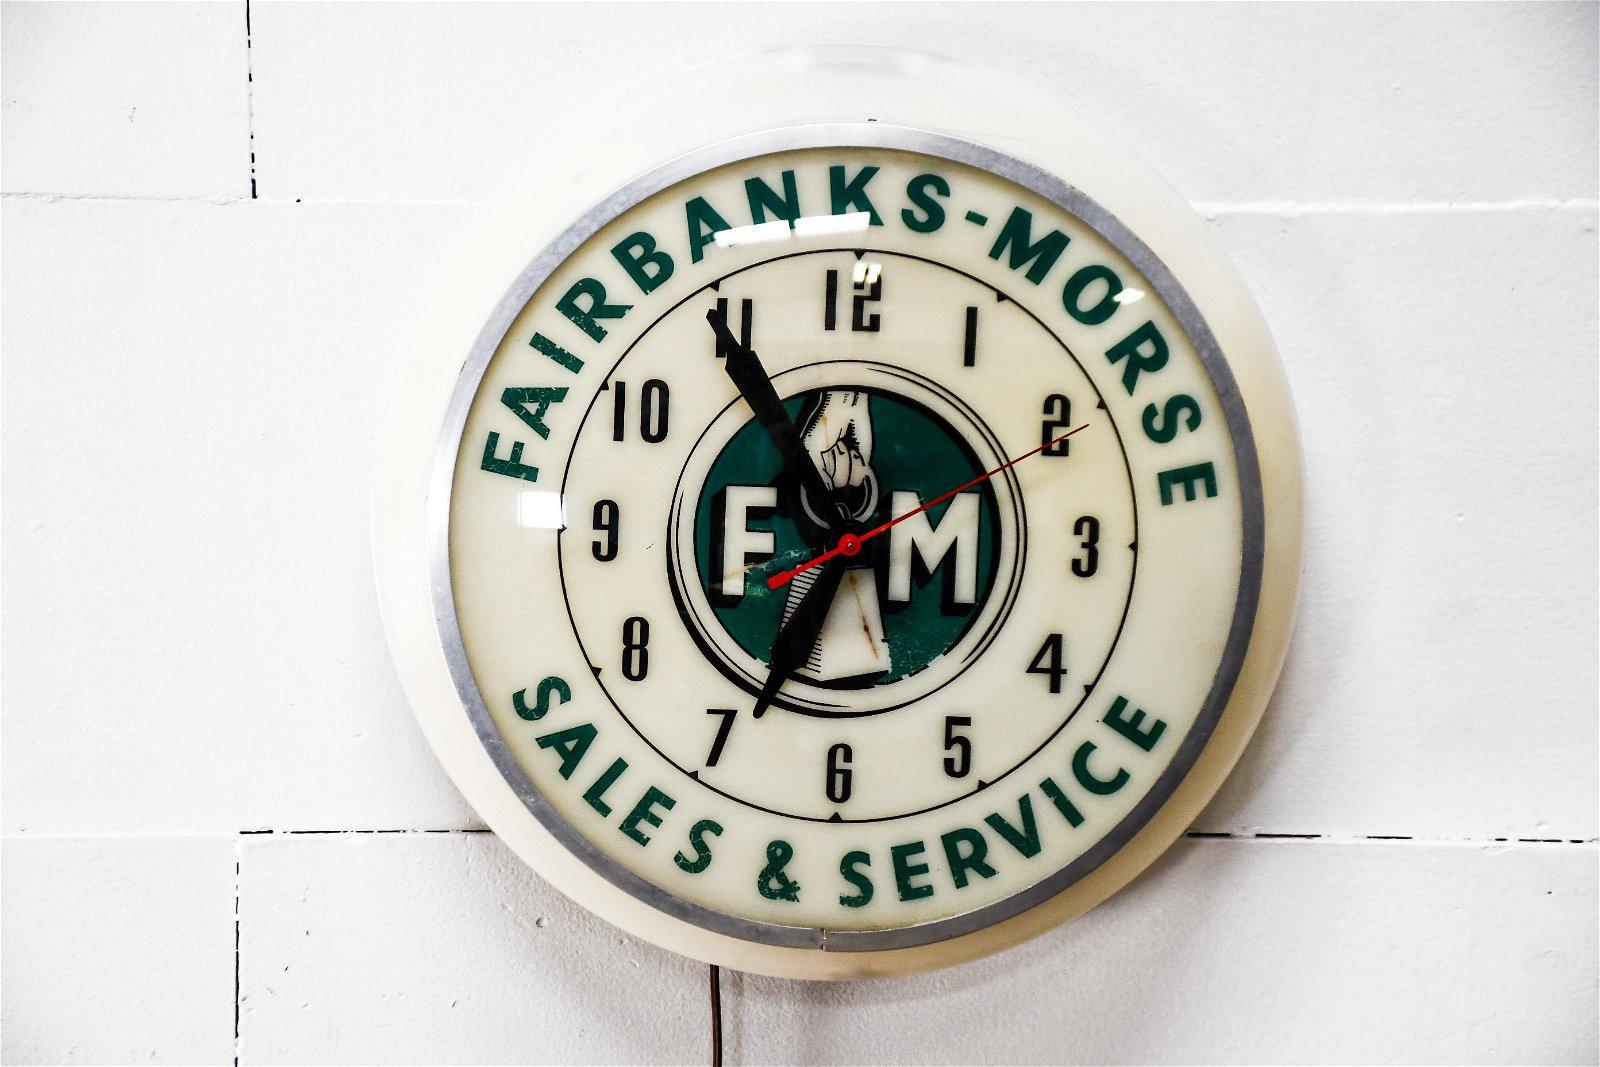 Fairbanks - Morse Advertising Clock - plastic